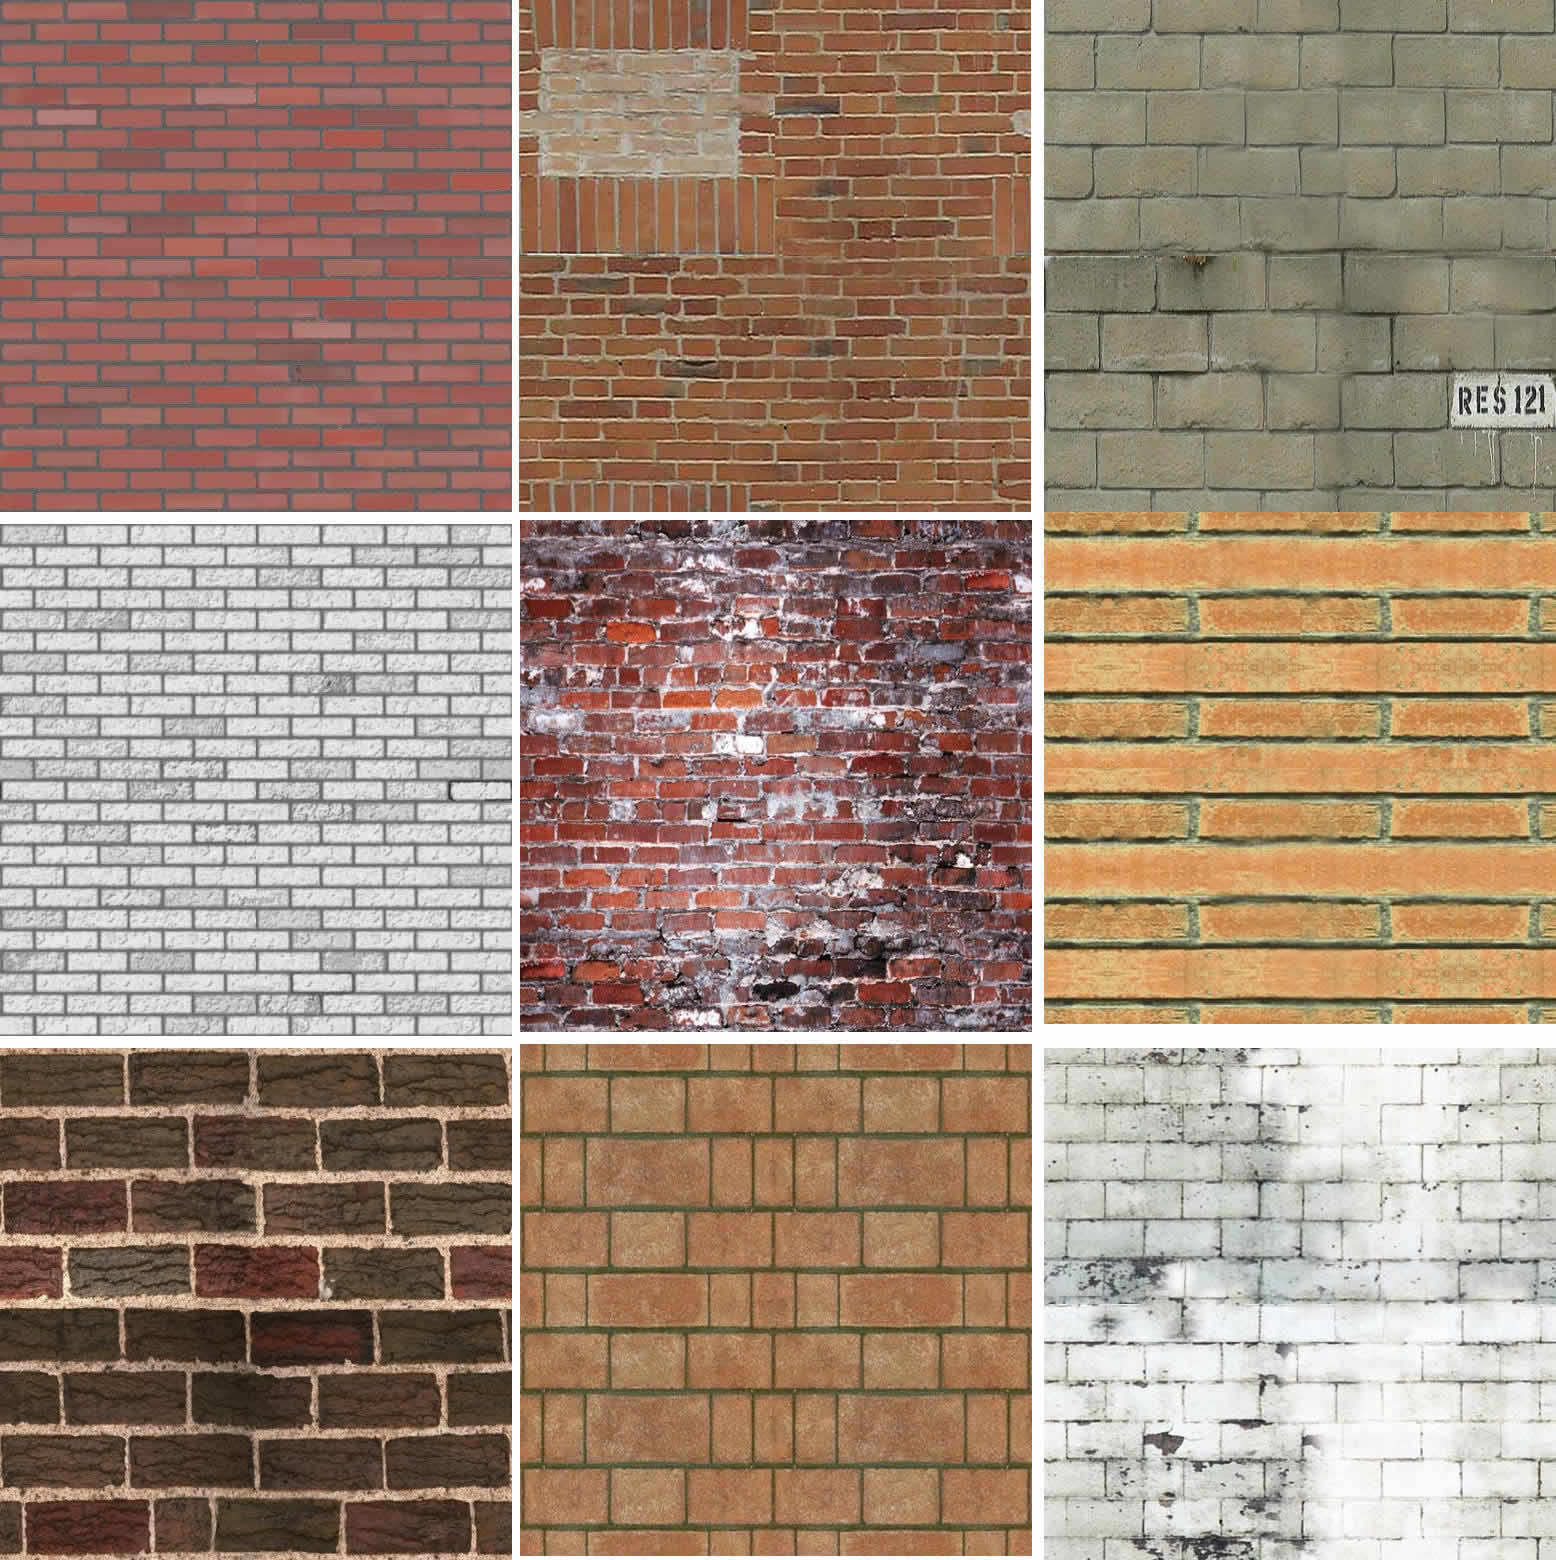 Textura de ladrillos, en Ladrillo visto – Texturas